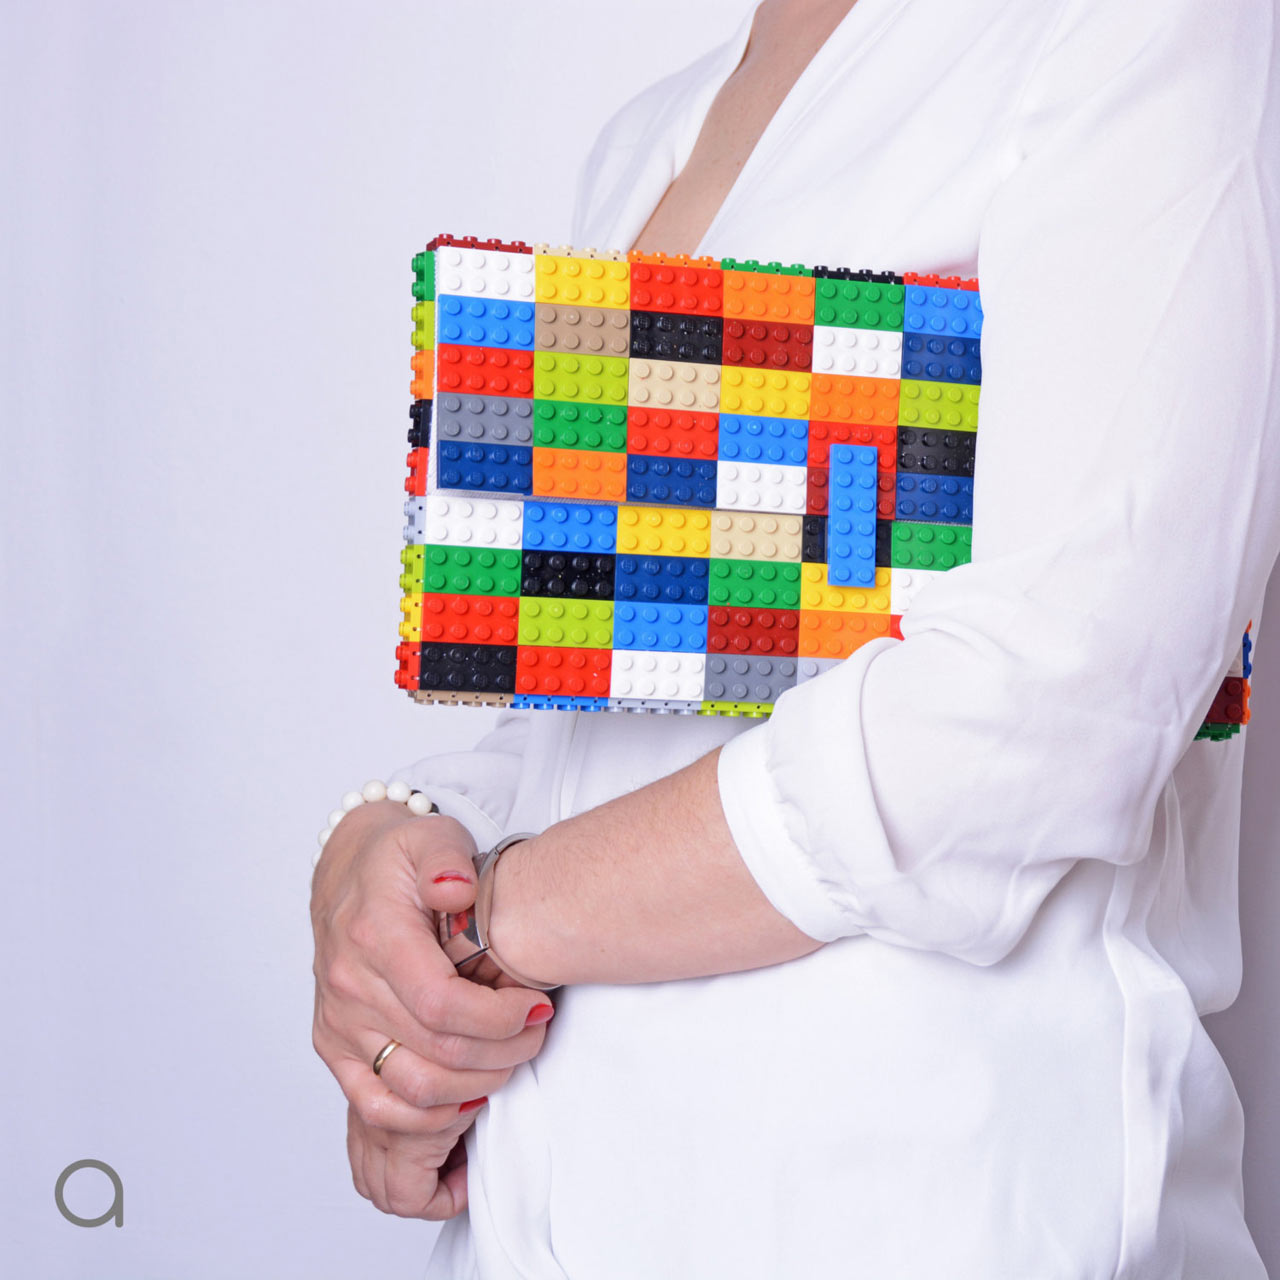 agabag: Handbags Made From LEGO Bricks